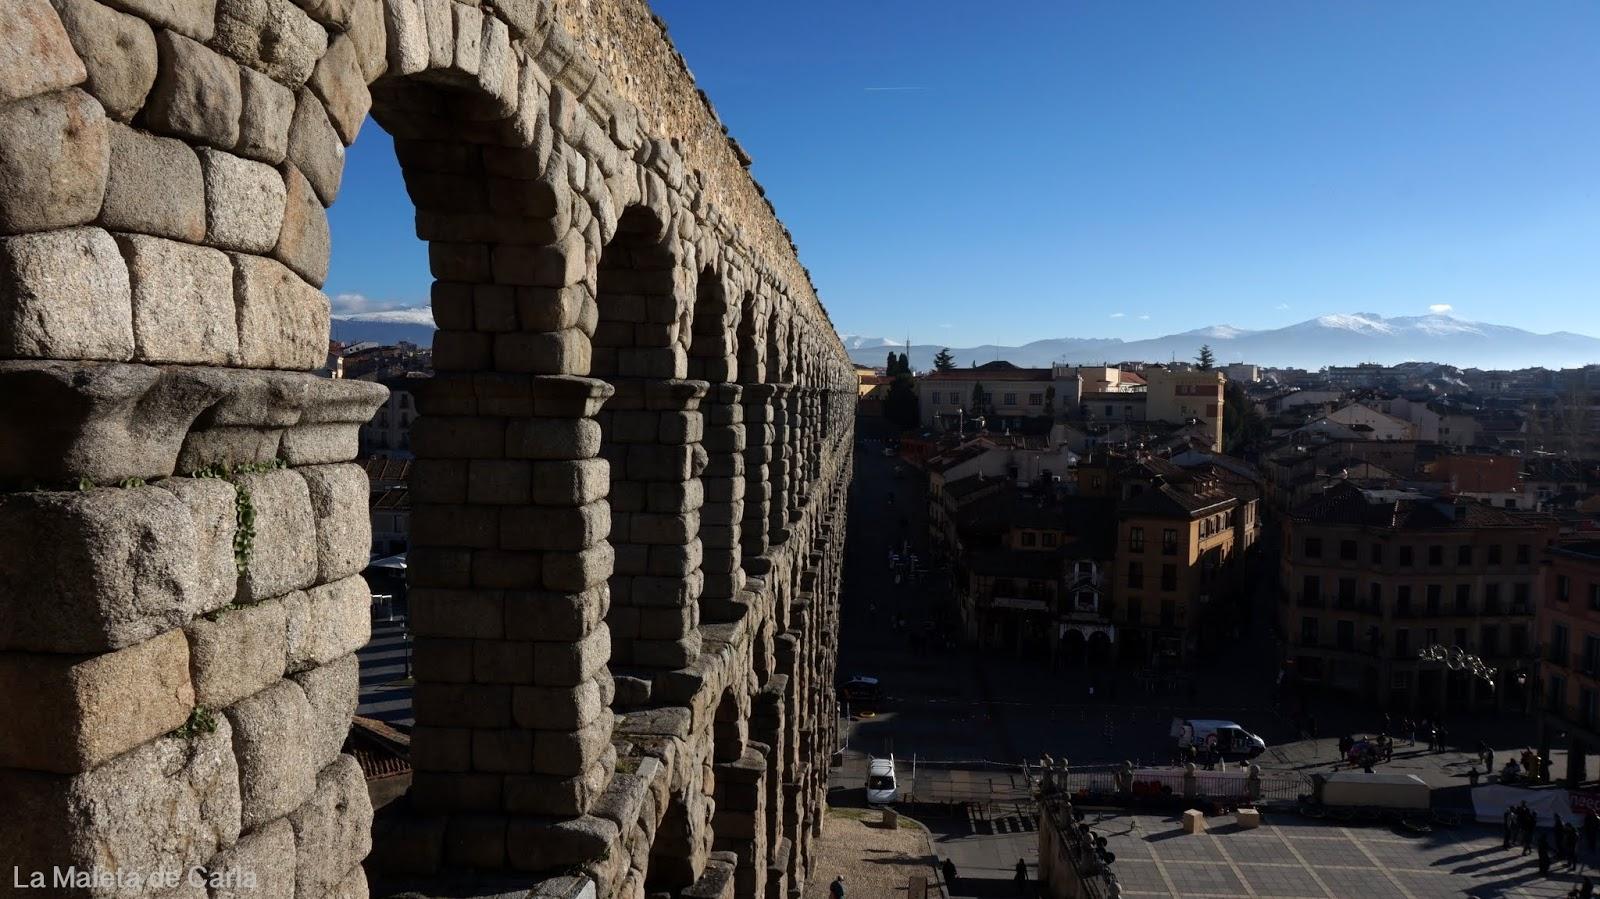 Mejores escapadas desde Madrid: Segovia